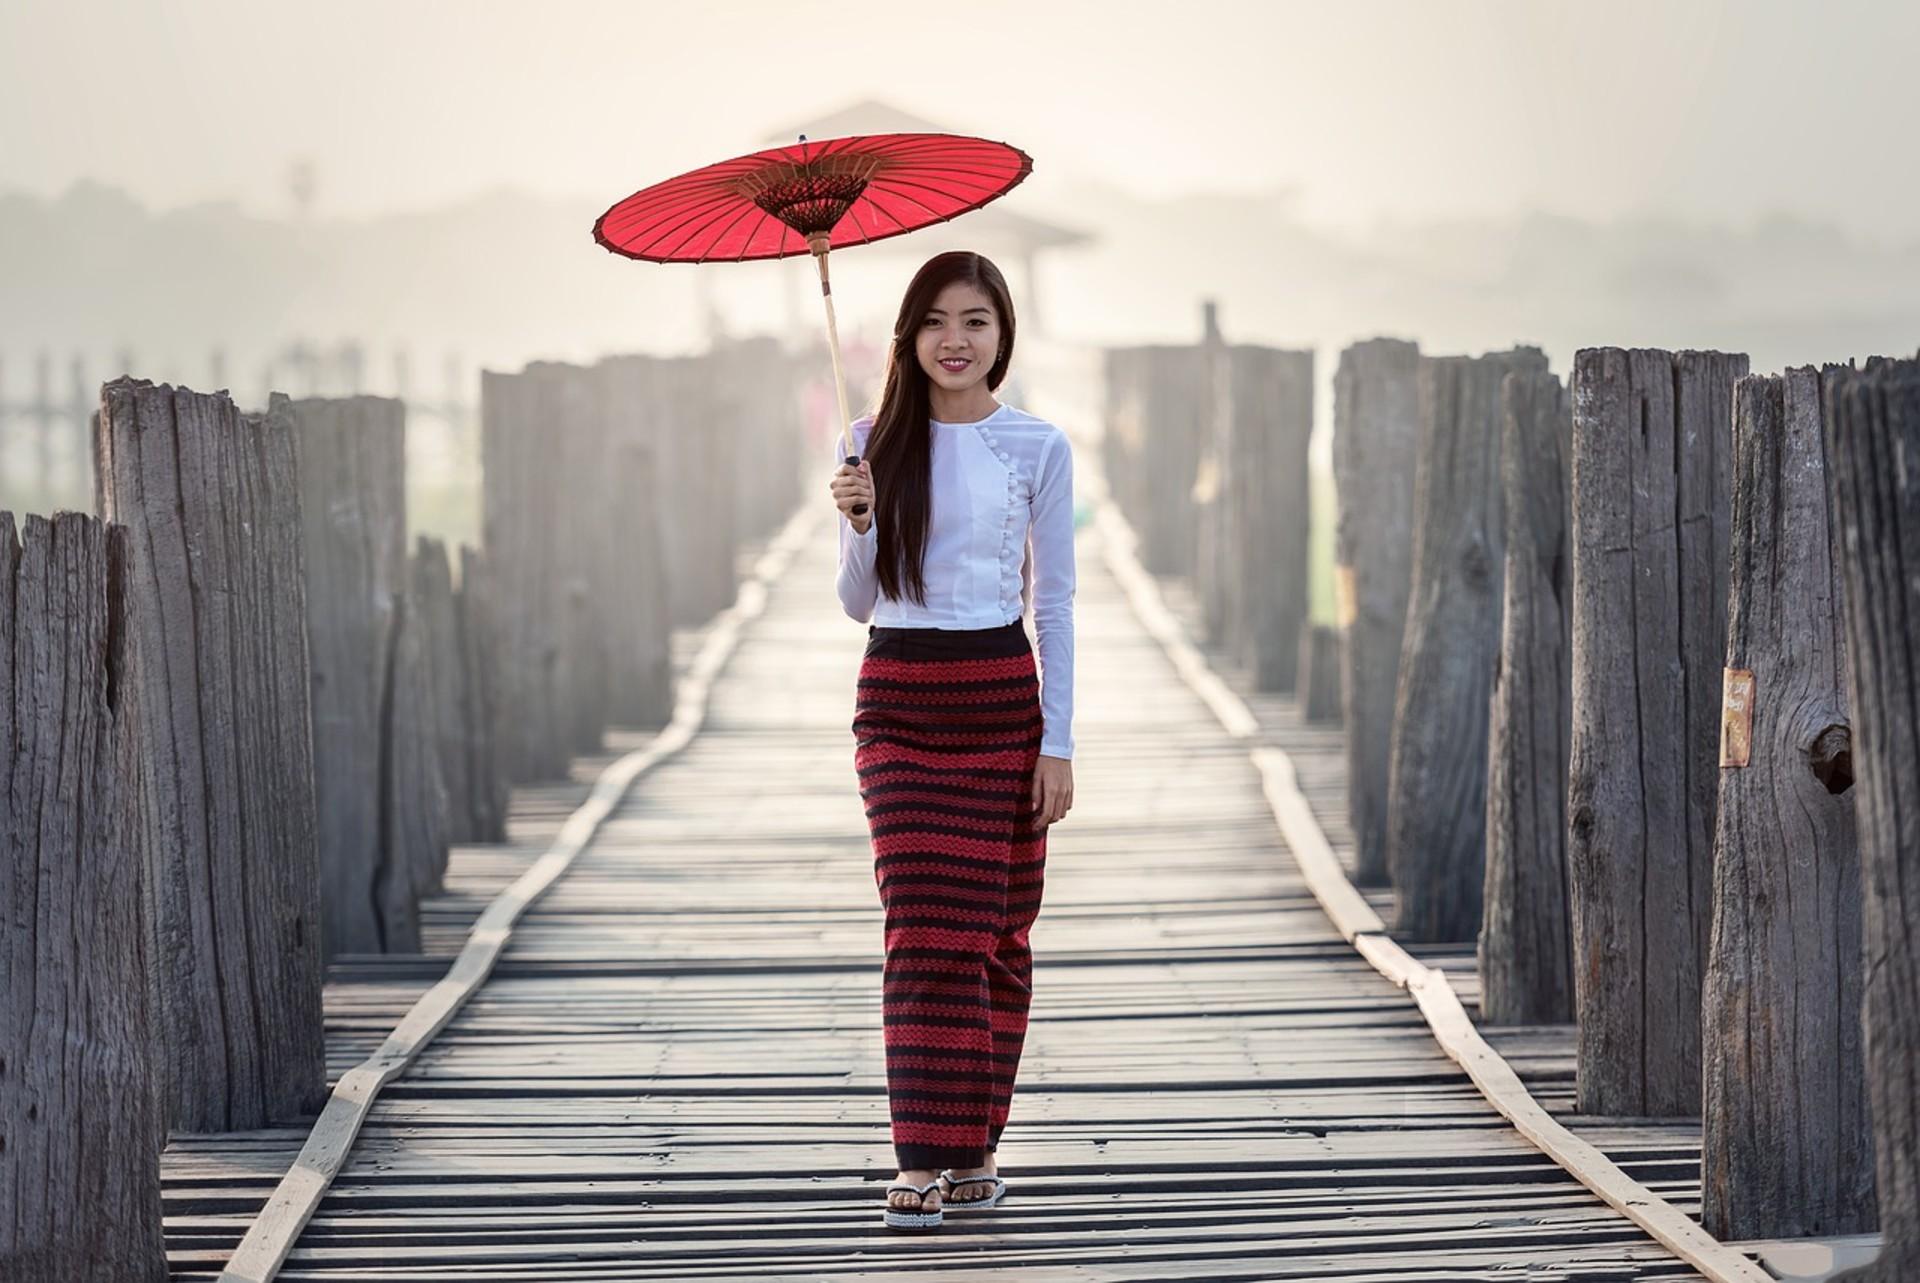 umbrella-1822586_1280.jpg